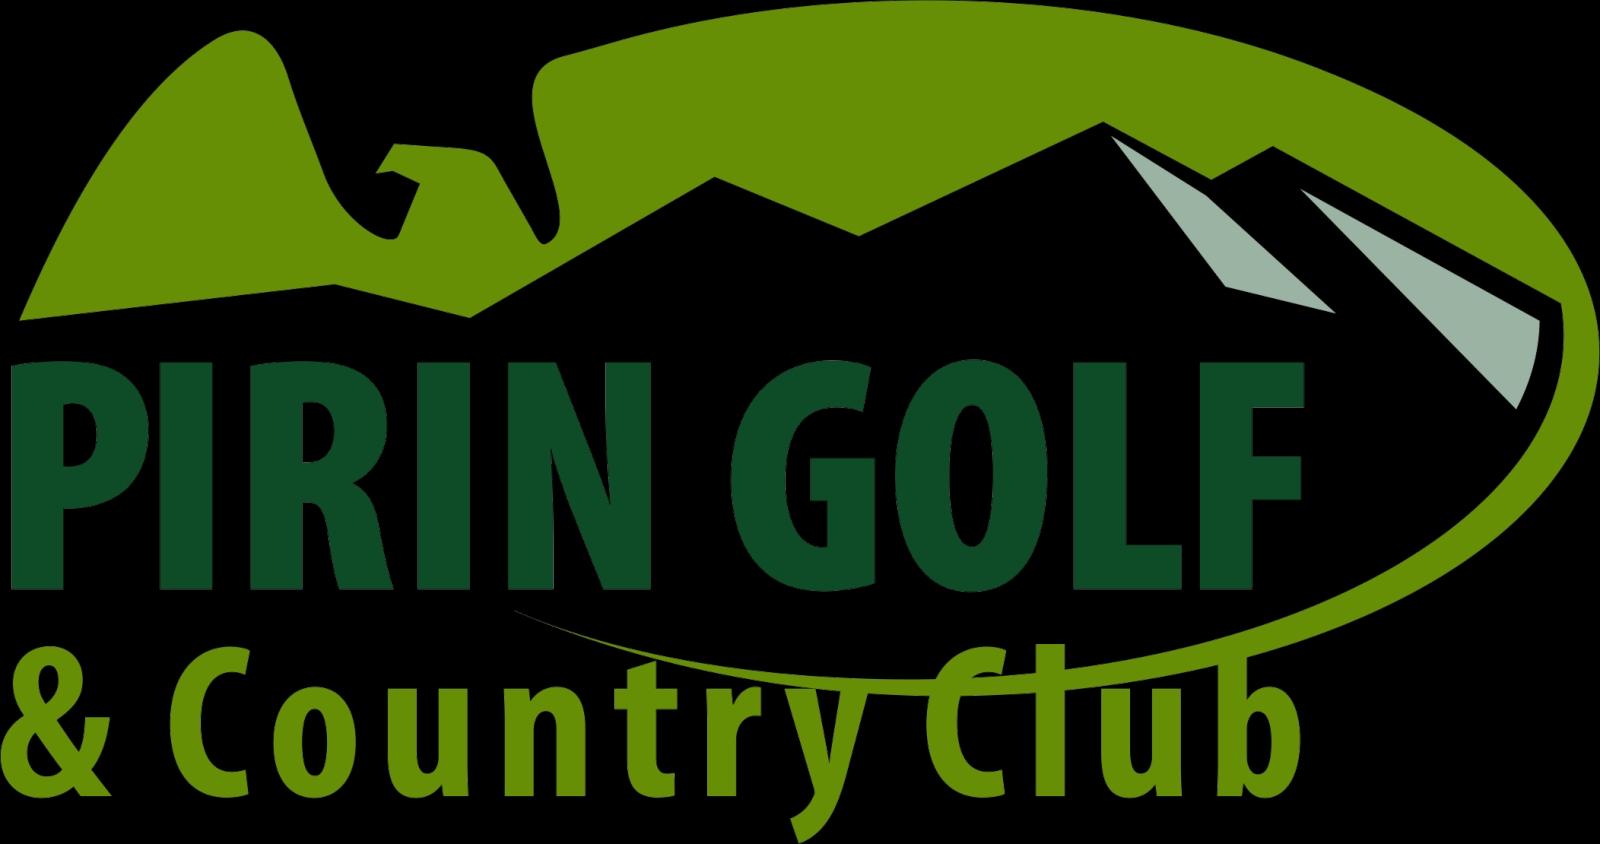 PirinGolf & CountryClub